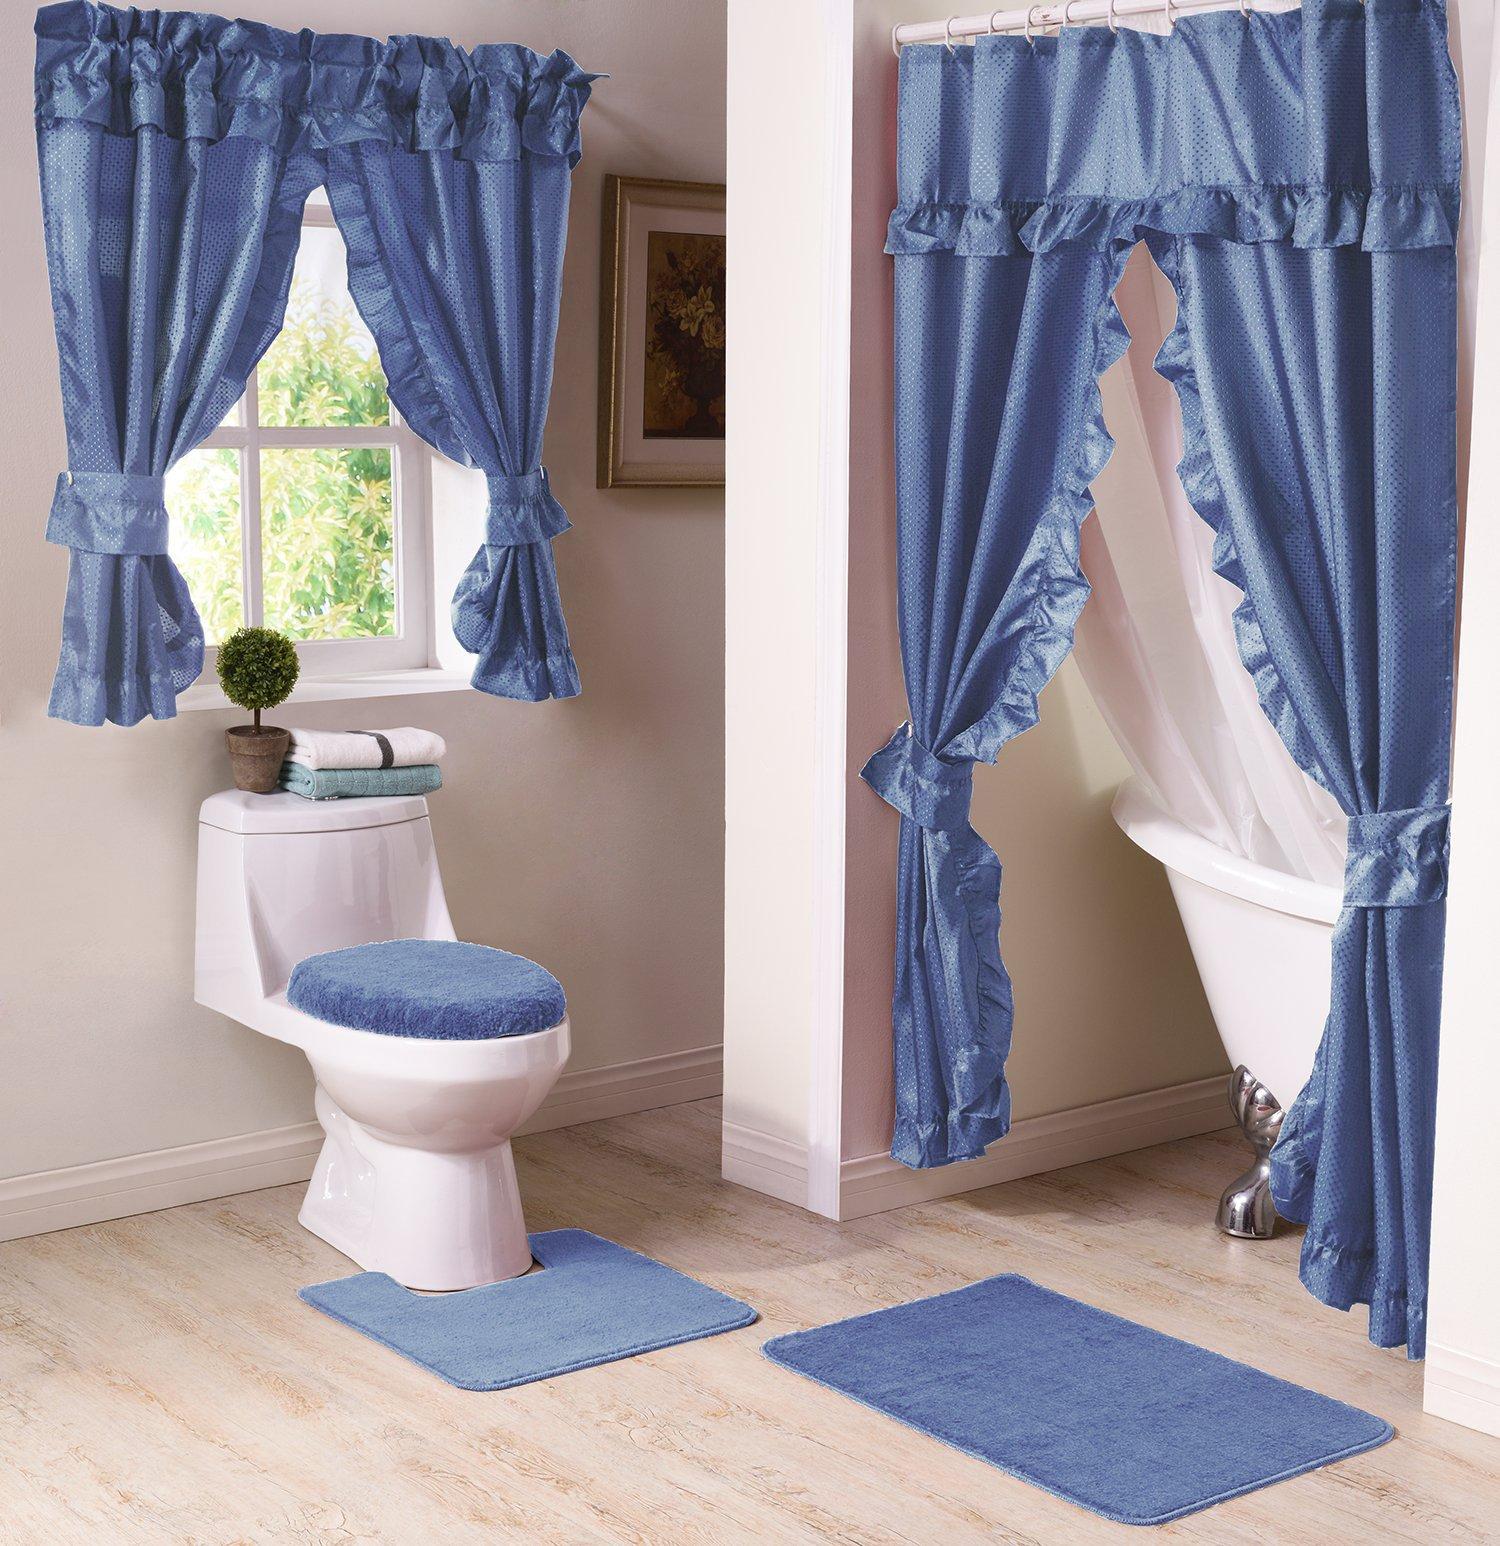 Madison Starlite Deluxe Swag Shower Blue Bathroom Window Curtain,